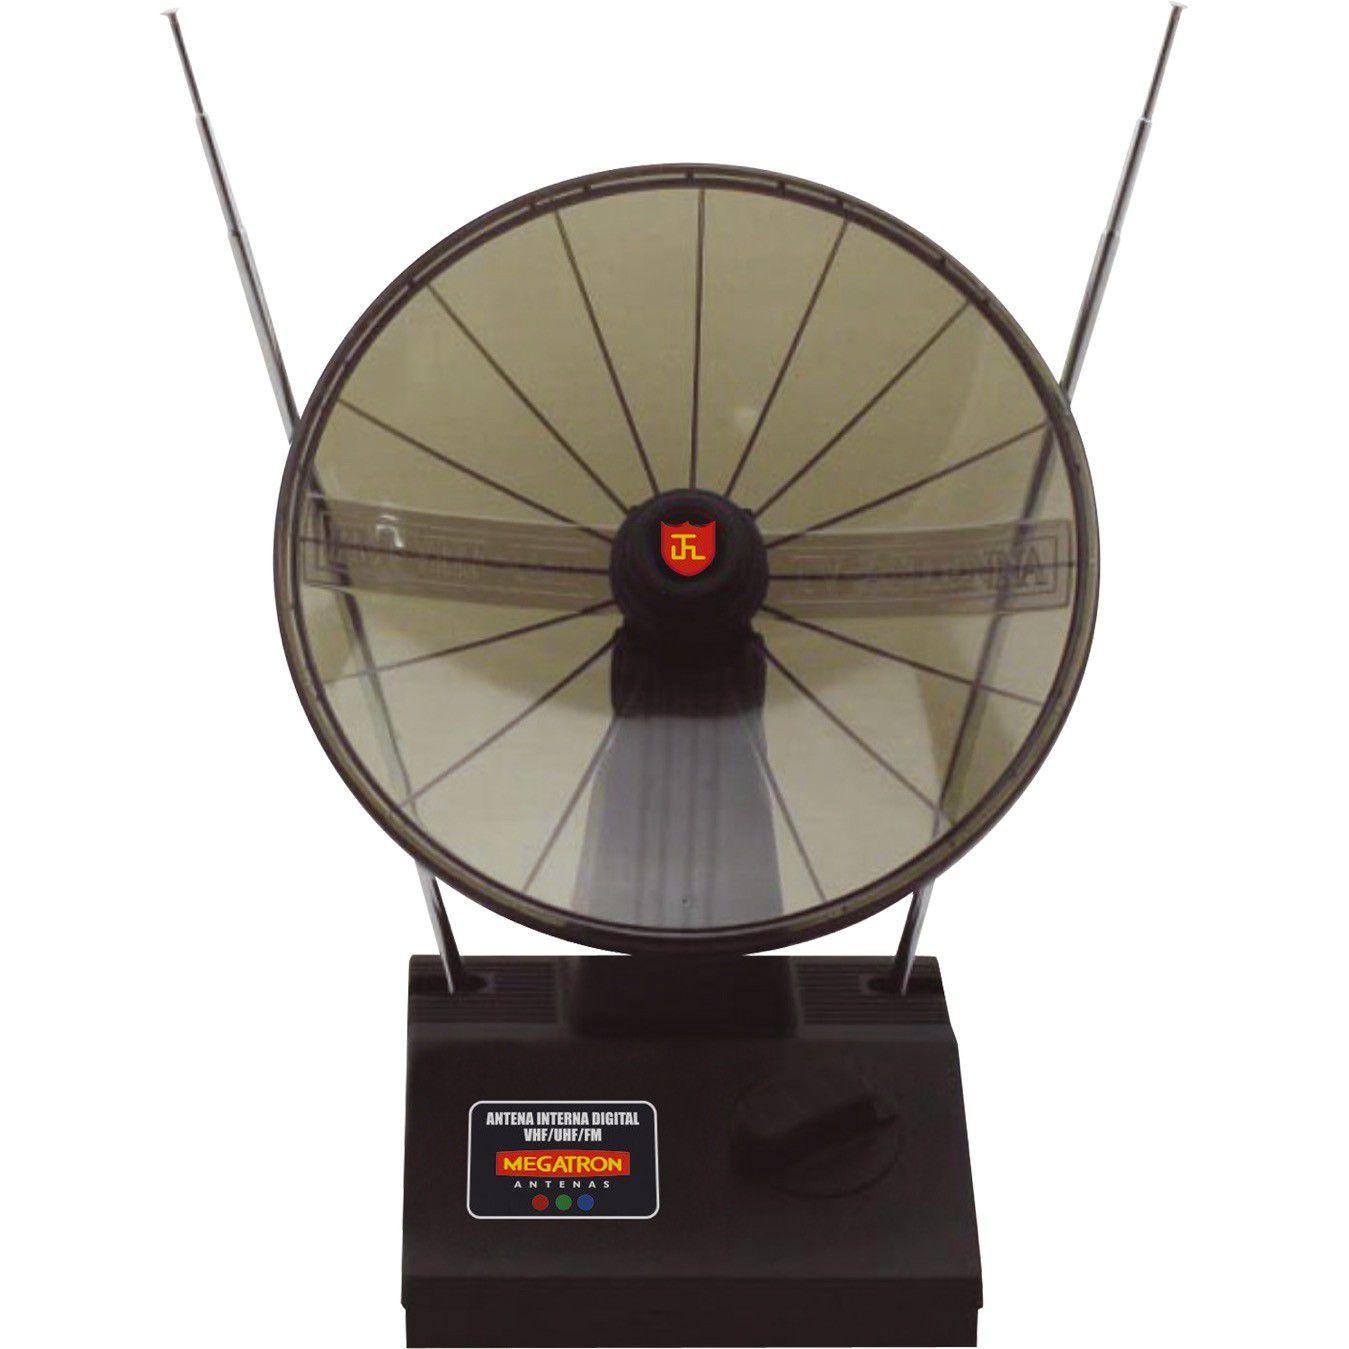 Antena Tv Interna Digital Miniparabolica Megatron